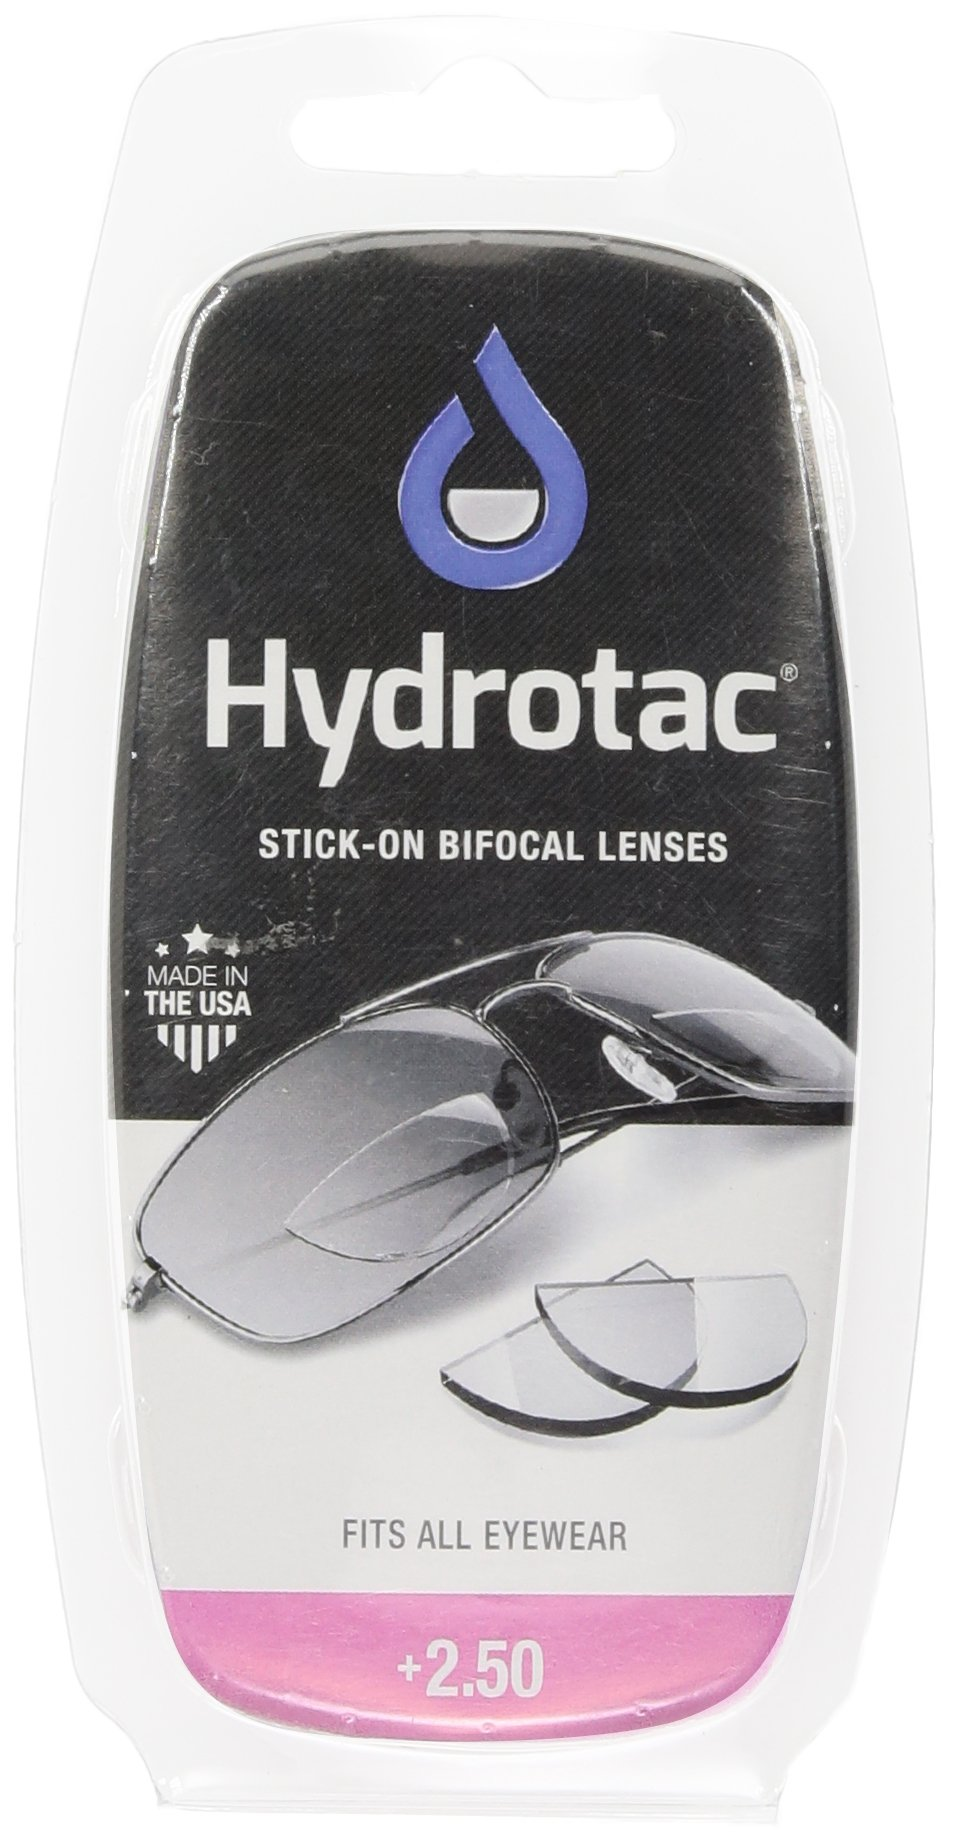 Optx 20/20 Hydrotac Stick-On Bifocal Reading Lens, +250 by OPTX 20/20